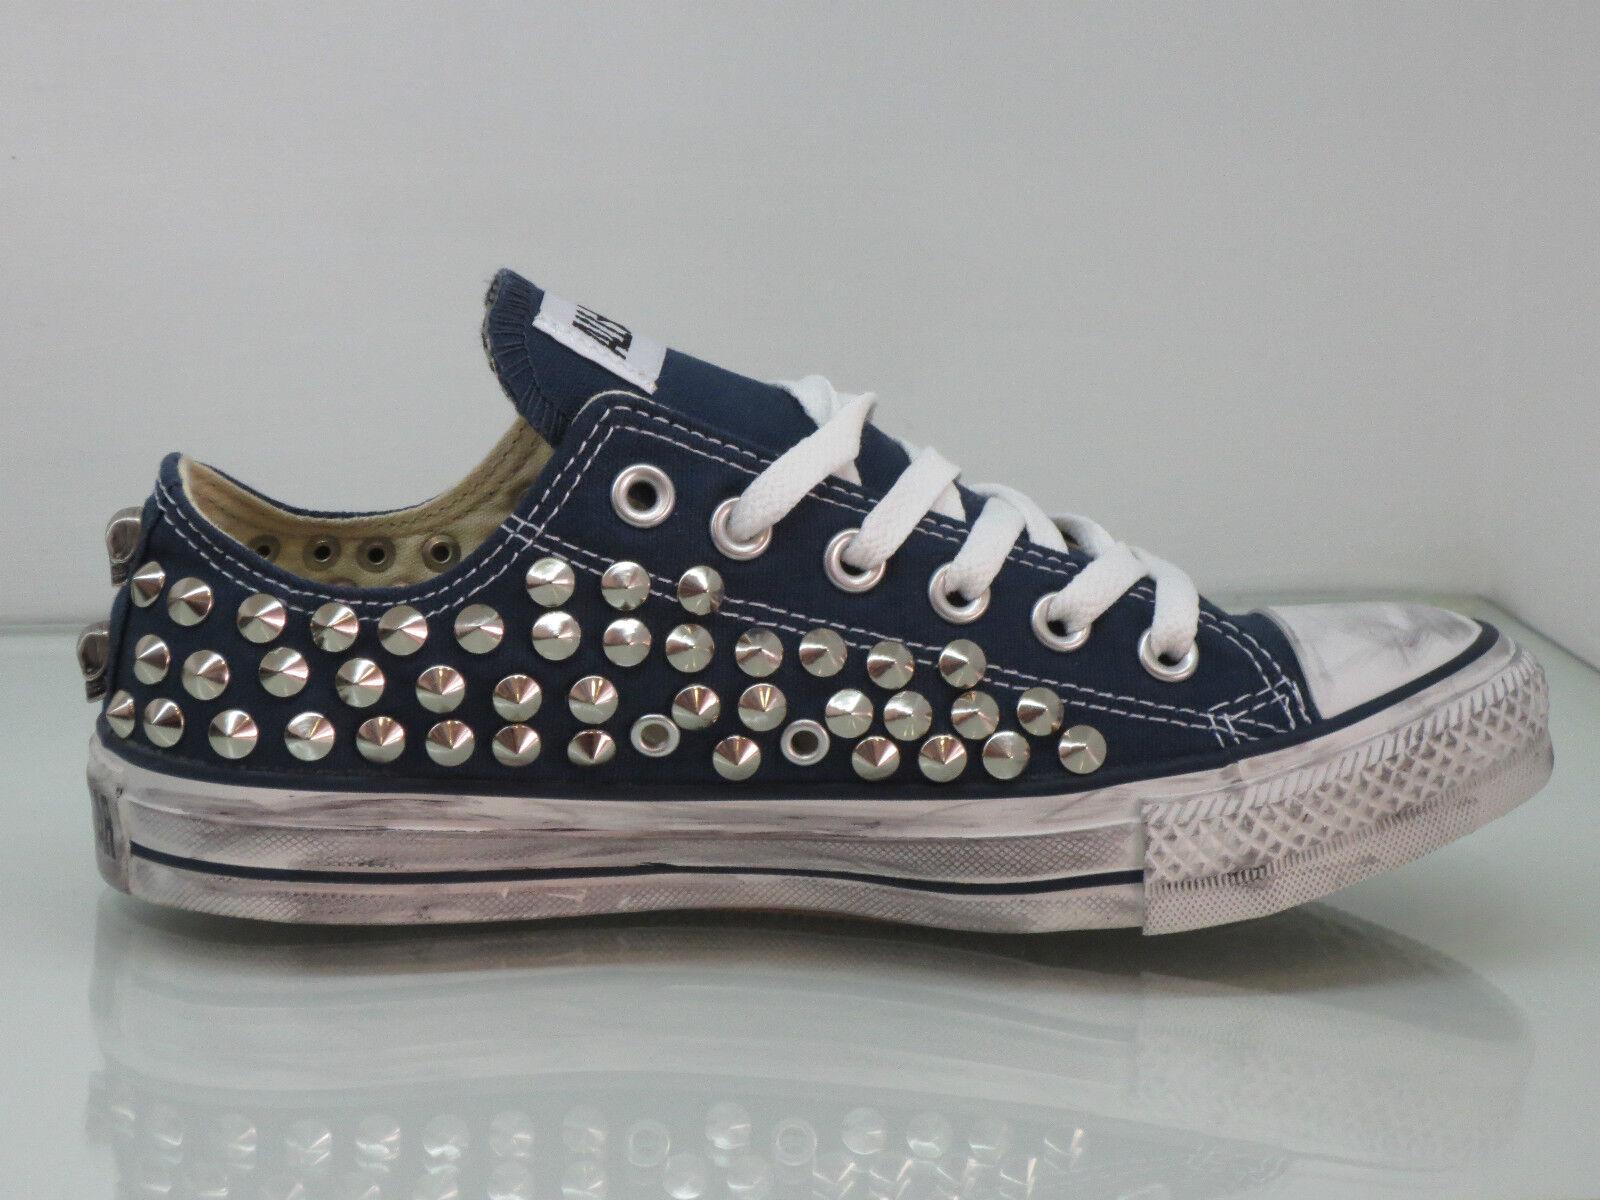 Converse all star star star OX  borchie teschi  scarpe  bianco optical white artigianali e5f1d3